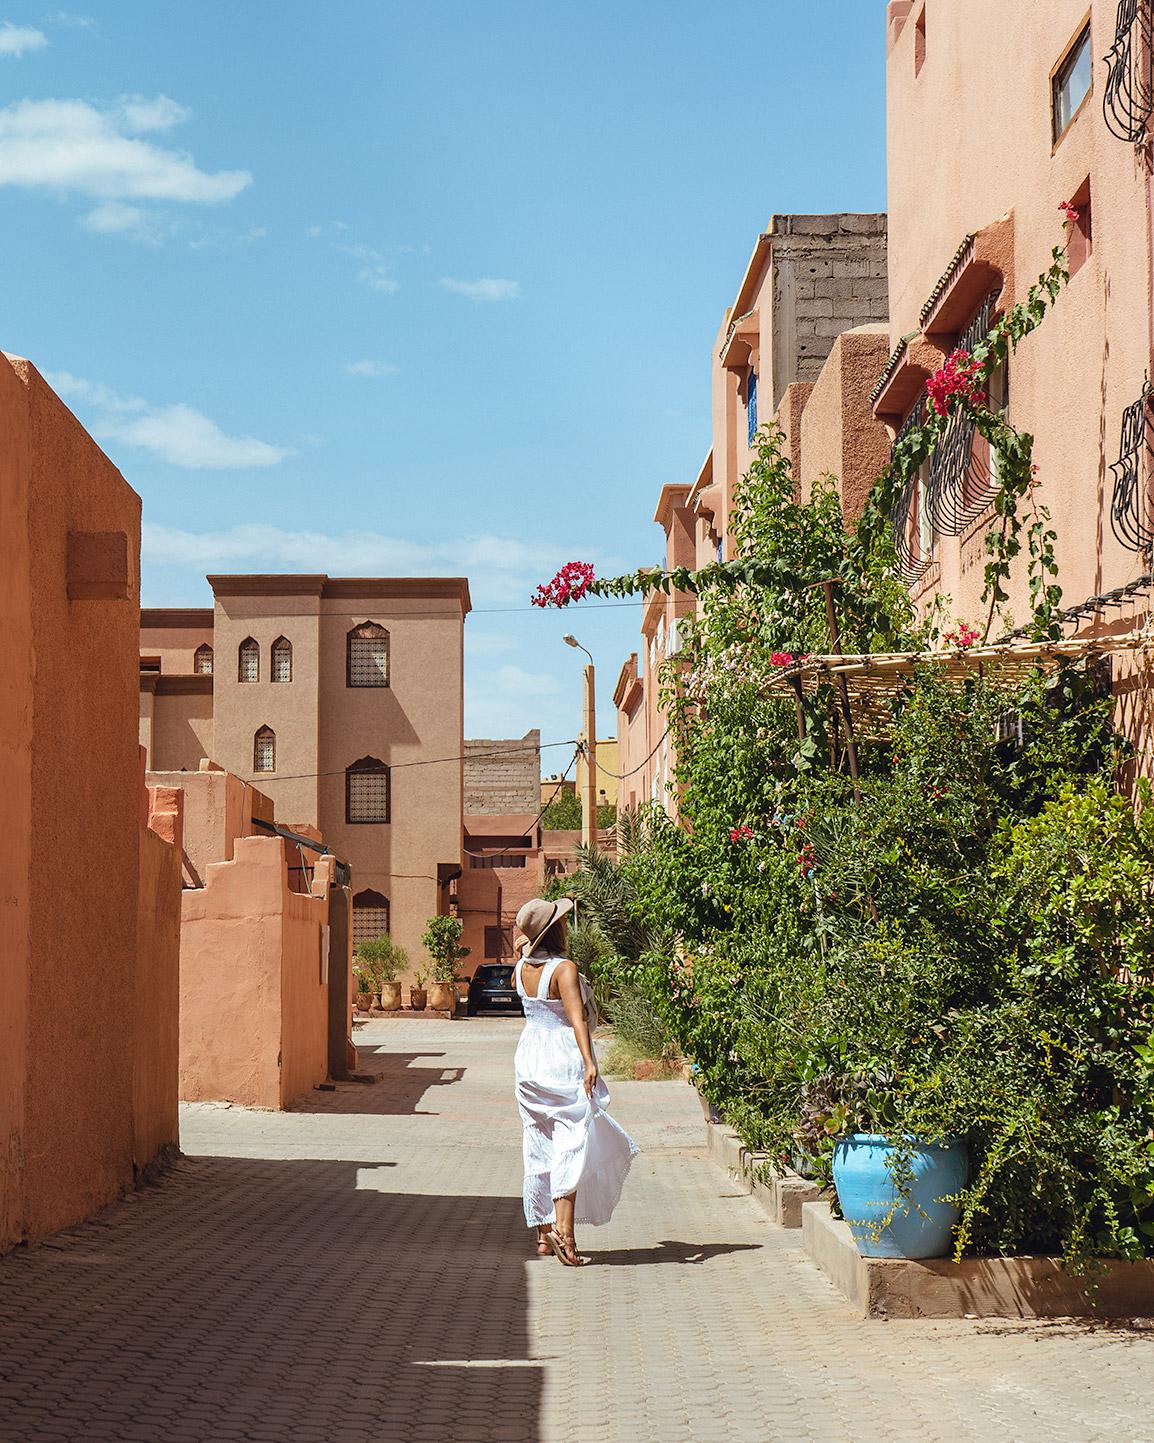 Maria numa rua em Ouarzazate